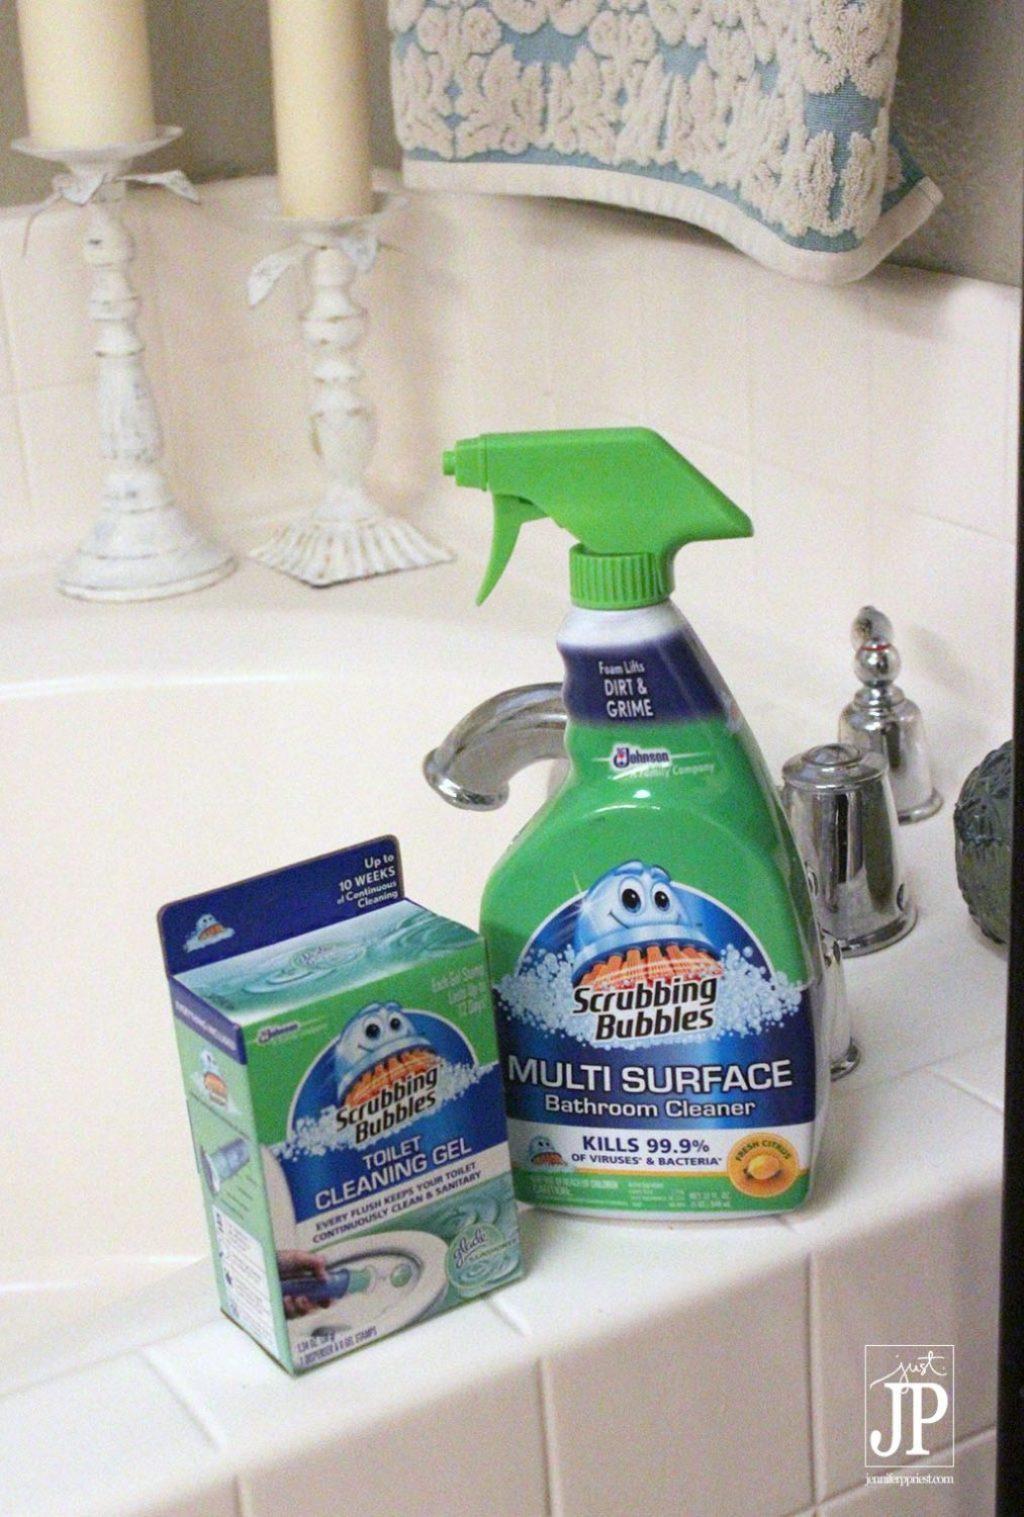 Make bathroom cleaner - Scrubbing Bubbles Bathroom Cleaner And Toilet Gel Make Bathroom A Clean Relaxing Retreat Jpriest